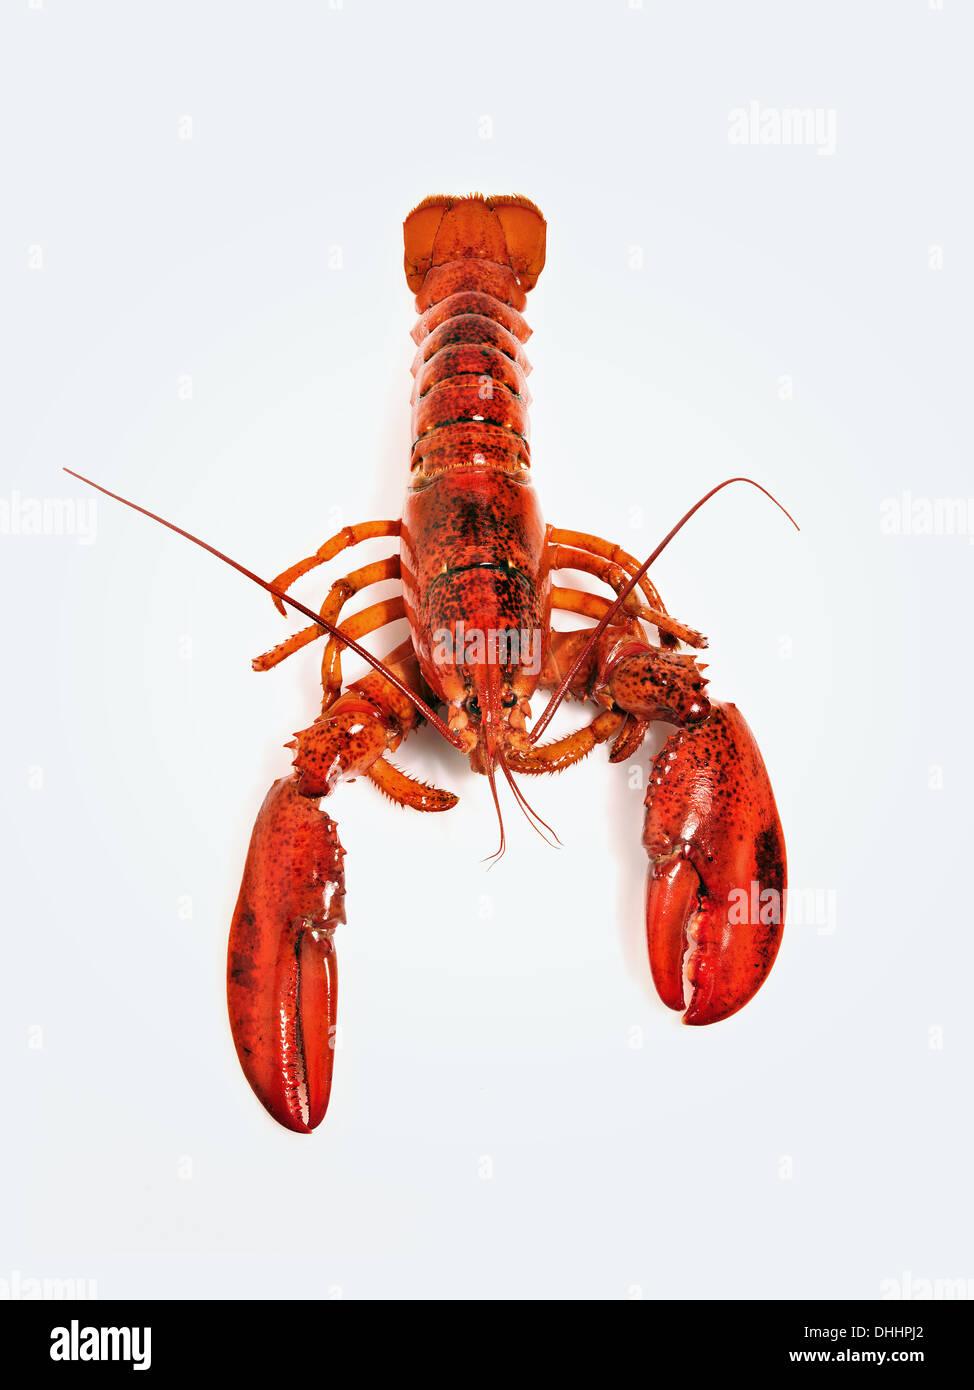 Lobster against white background - Stock Image